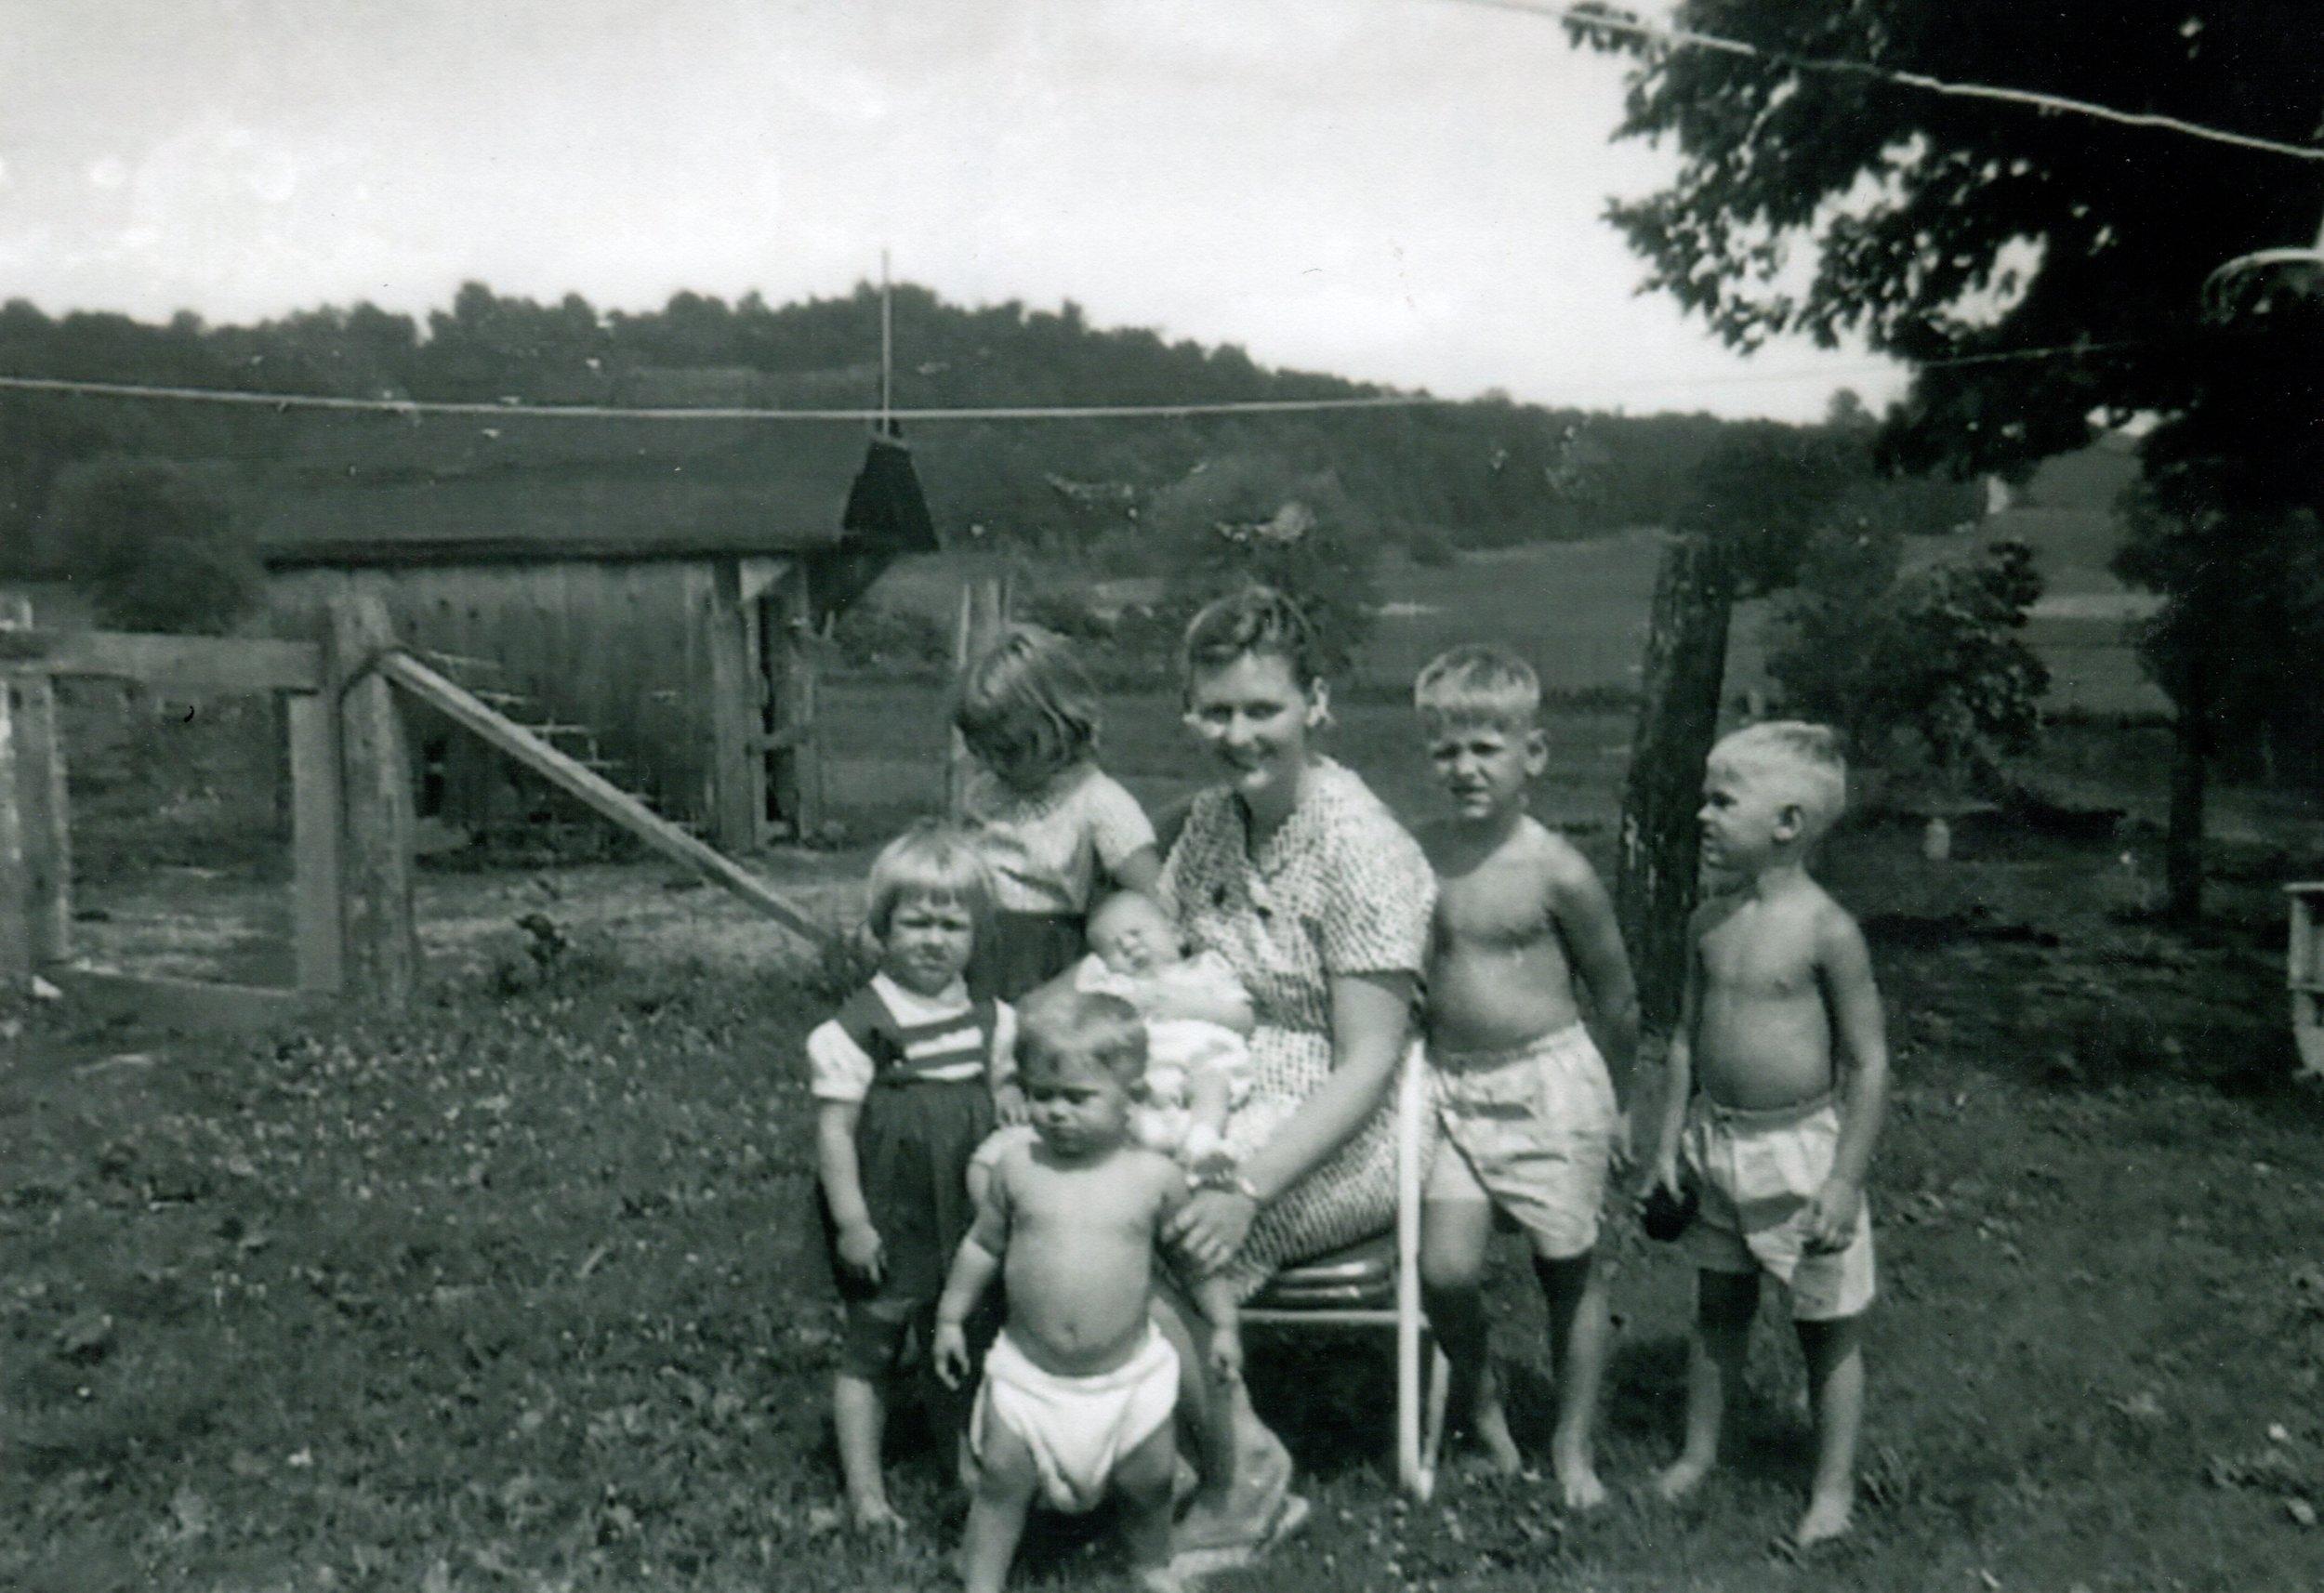 My mother's family farm